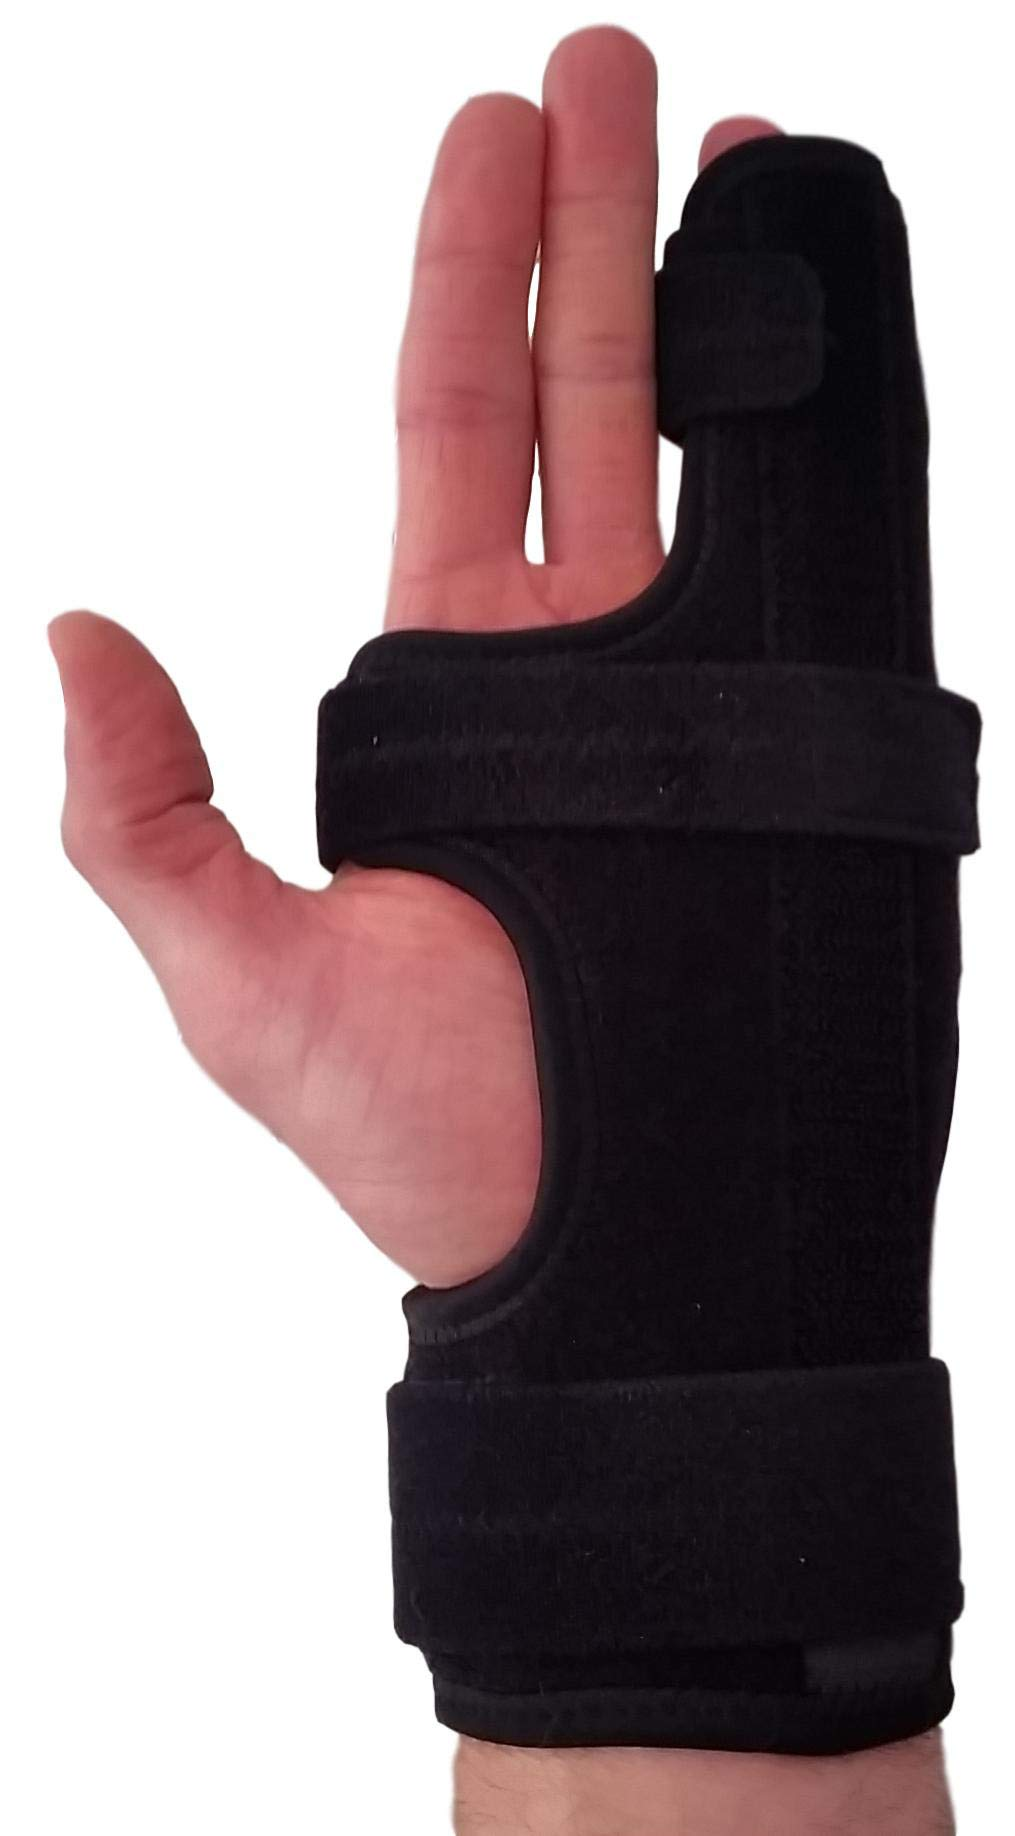 Metacarpal Finger Splint Hand Brace - Hand Brace & Metacarpal Support for Broken Fingers, Wrist & Hand Injuries or Little Finger Fracture (Left - Large) by ARMSTRONG AMERIKA